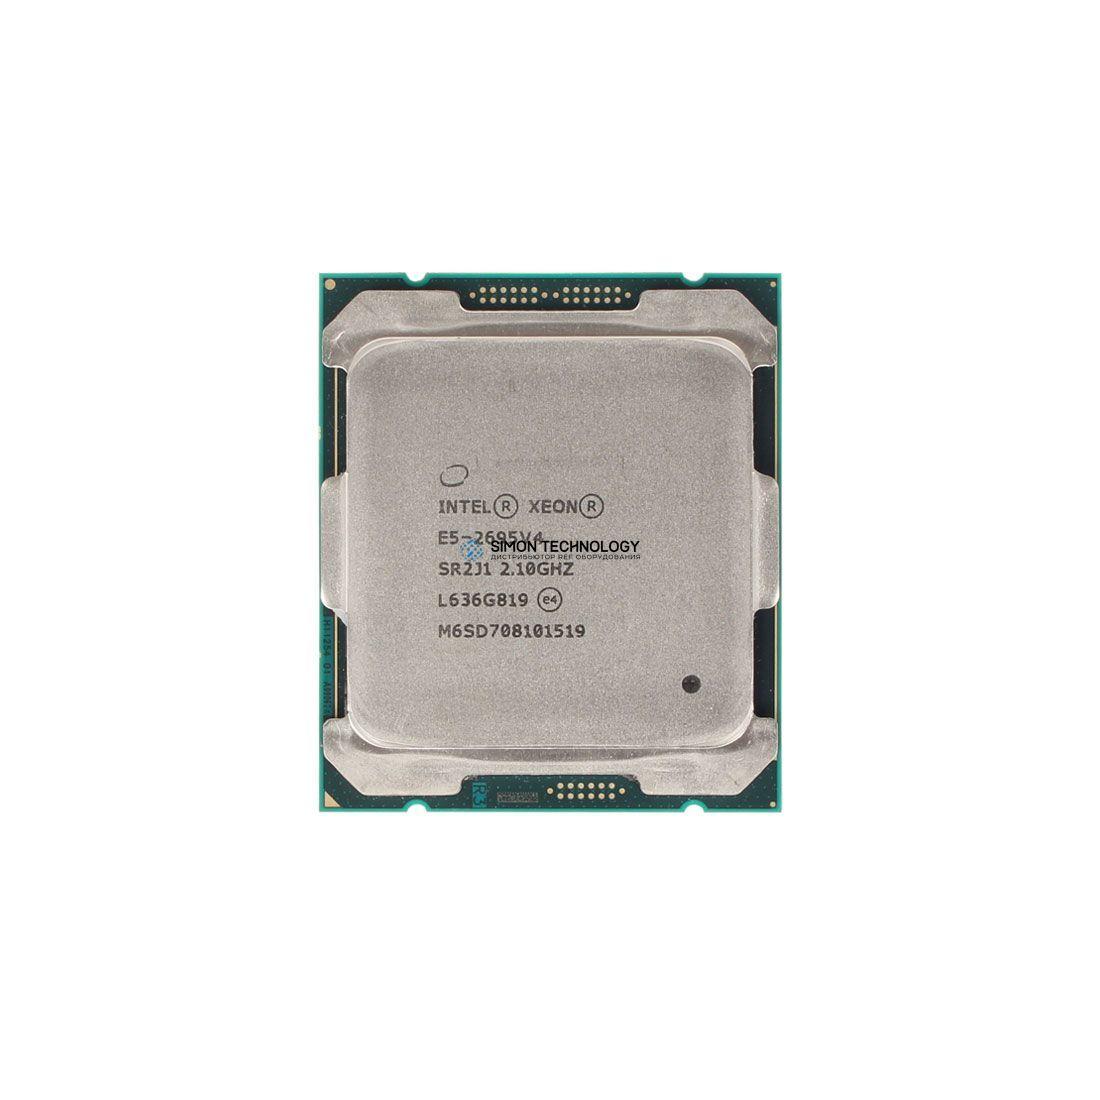 Процессор Intel Xeon 18C 2.1GHz 45MB 120W Processor (E5-2695V4)